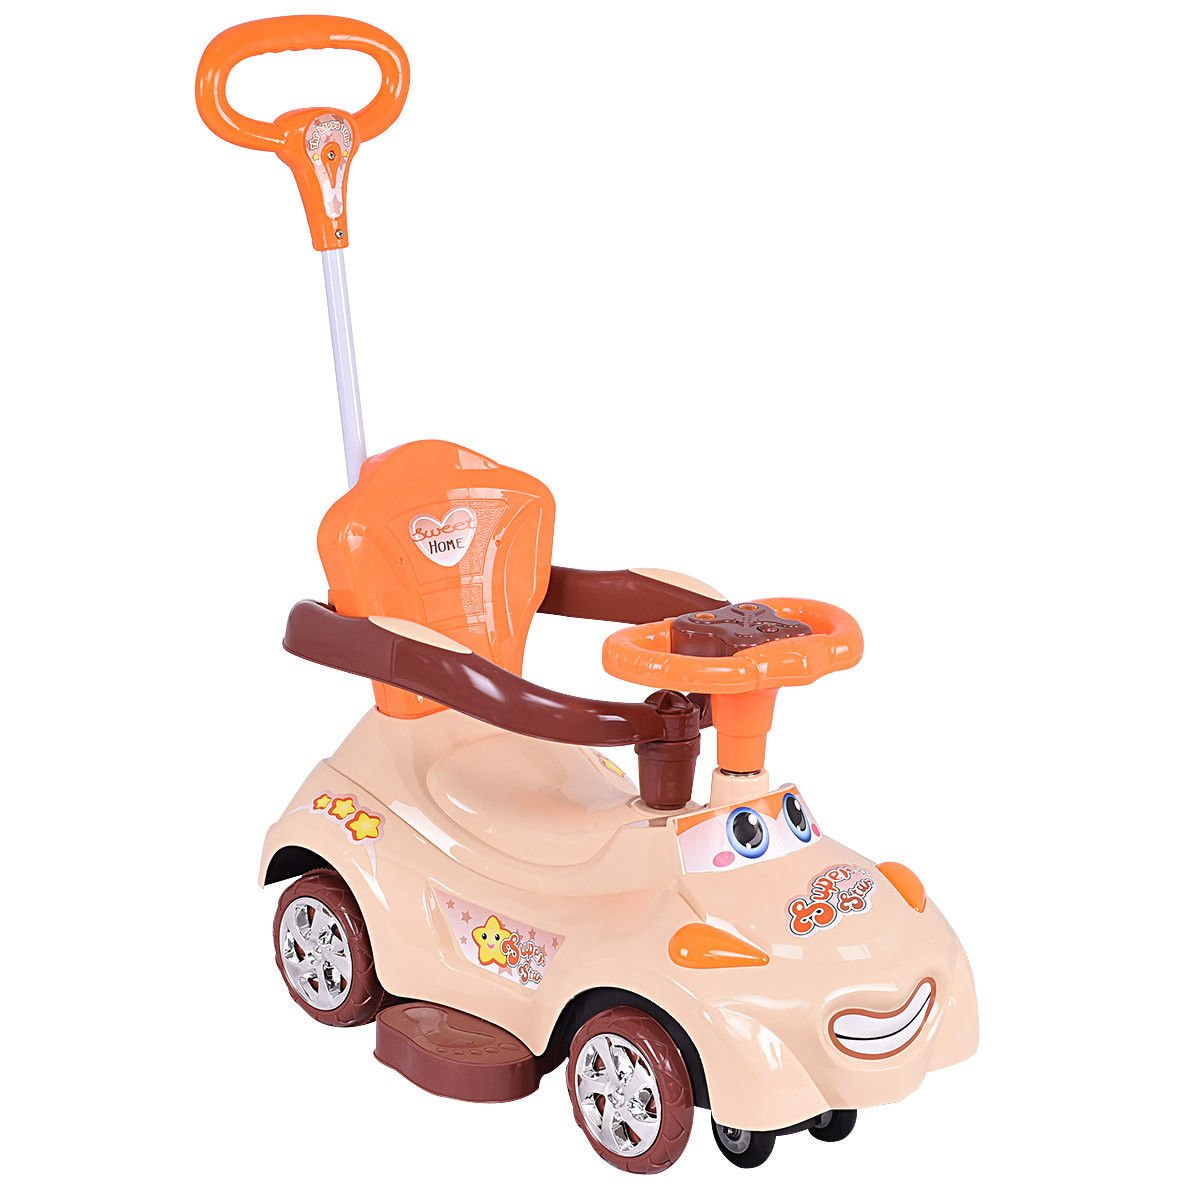 Costzon Kids Ride On Push Car, 3 in 1 Sliding Swinging Wagon w/ Handle Music (Coffee)